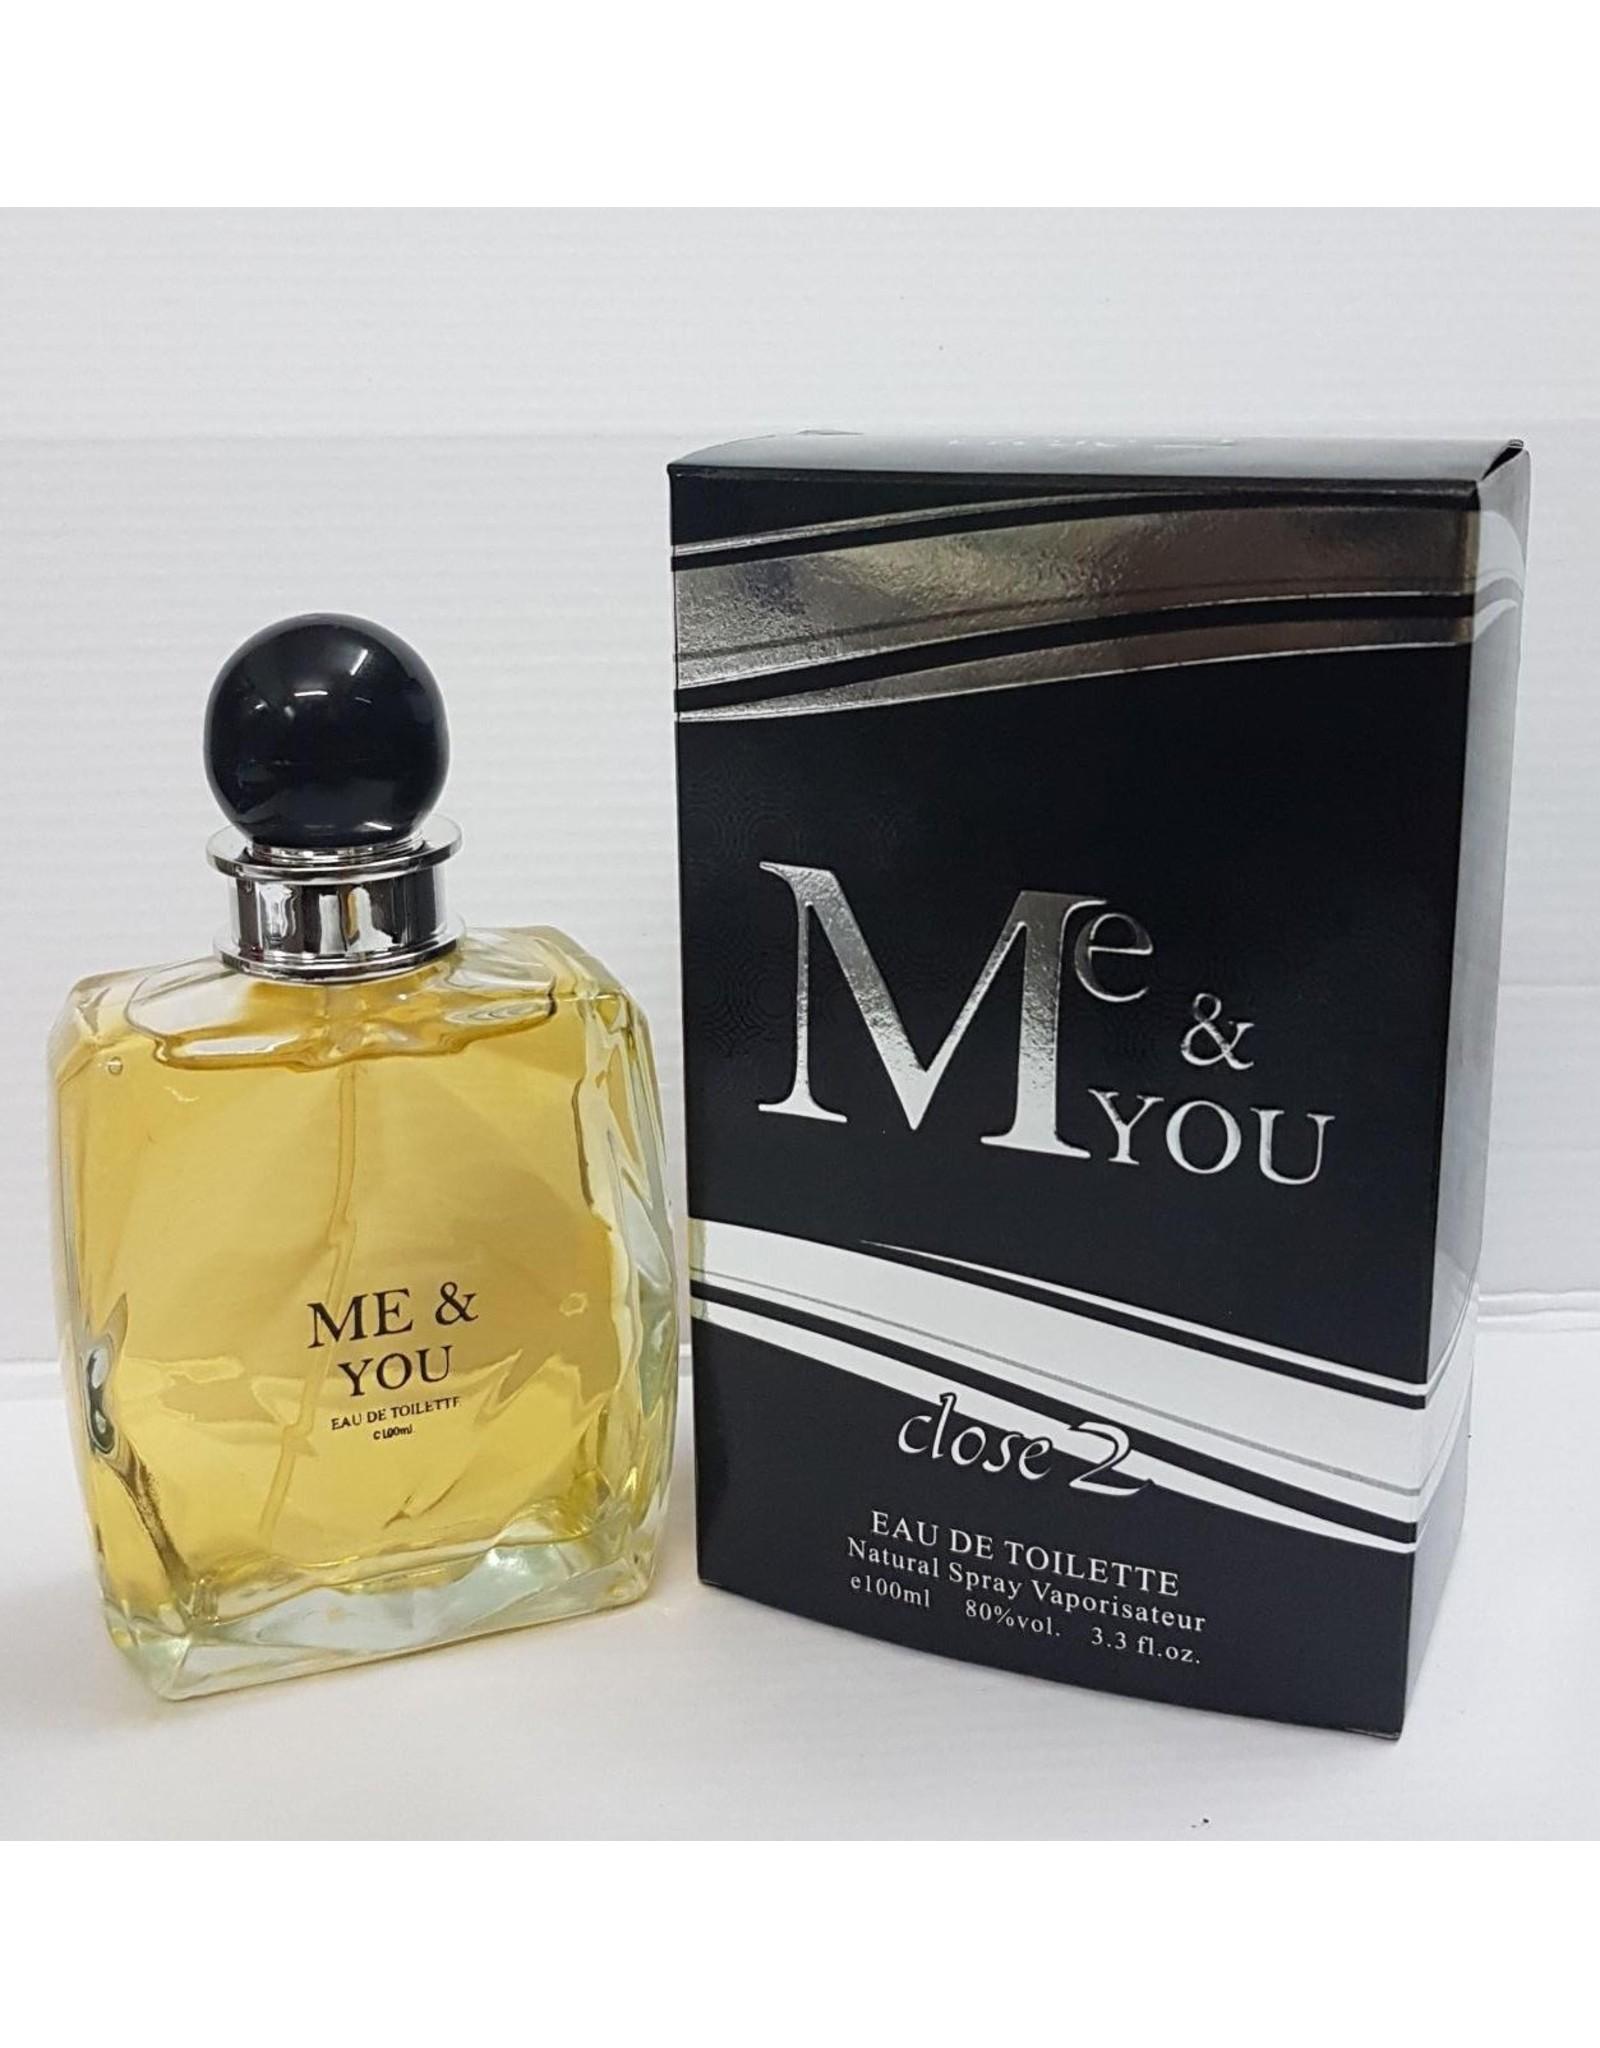 Close 2 parfums Me & you 100 ml EDT Heren